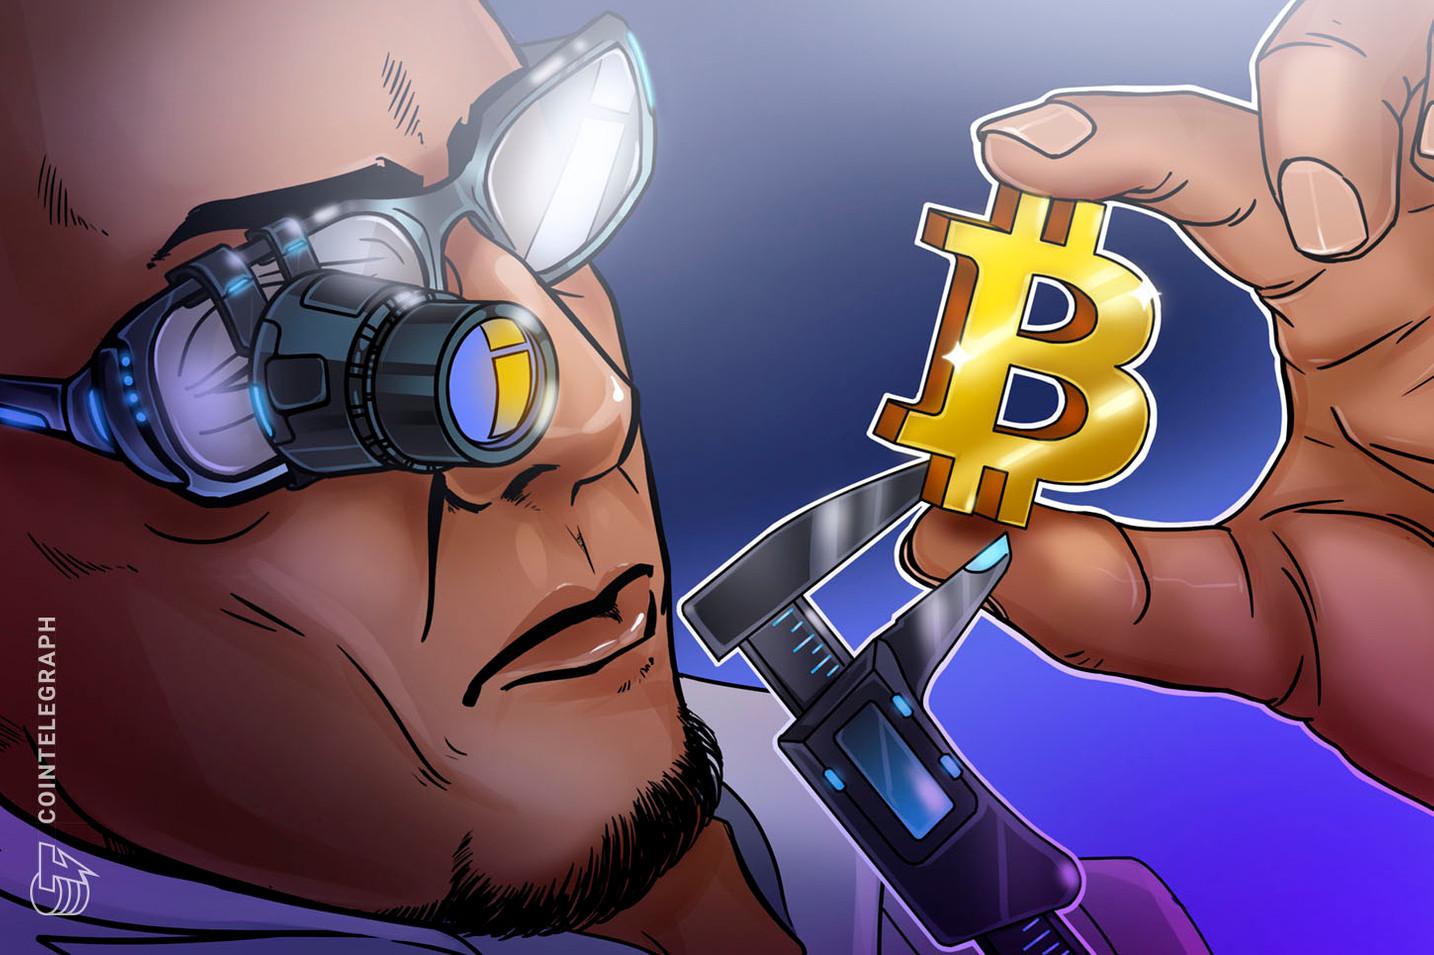 Bitcoin returns to $1T asset as BTC price blasts to $55K